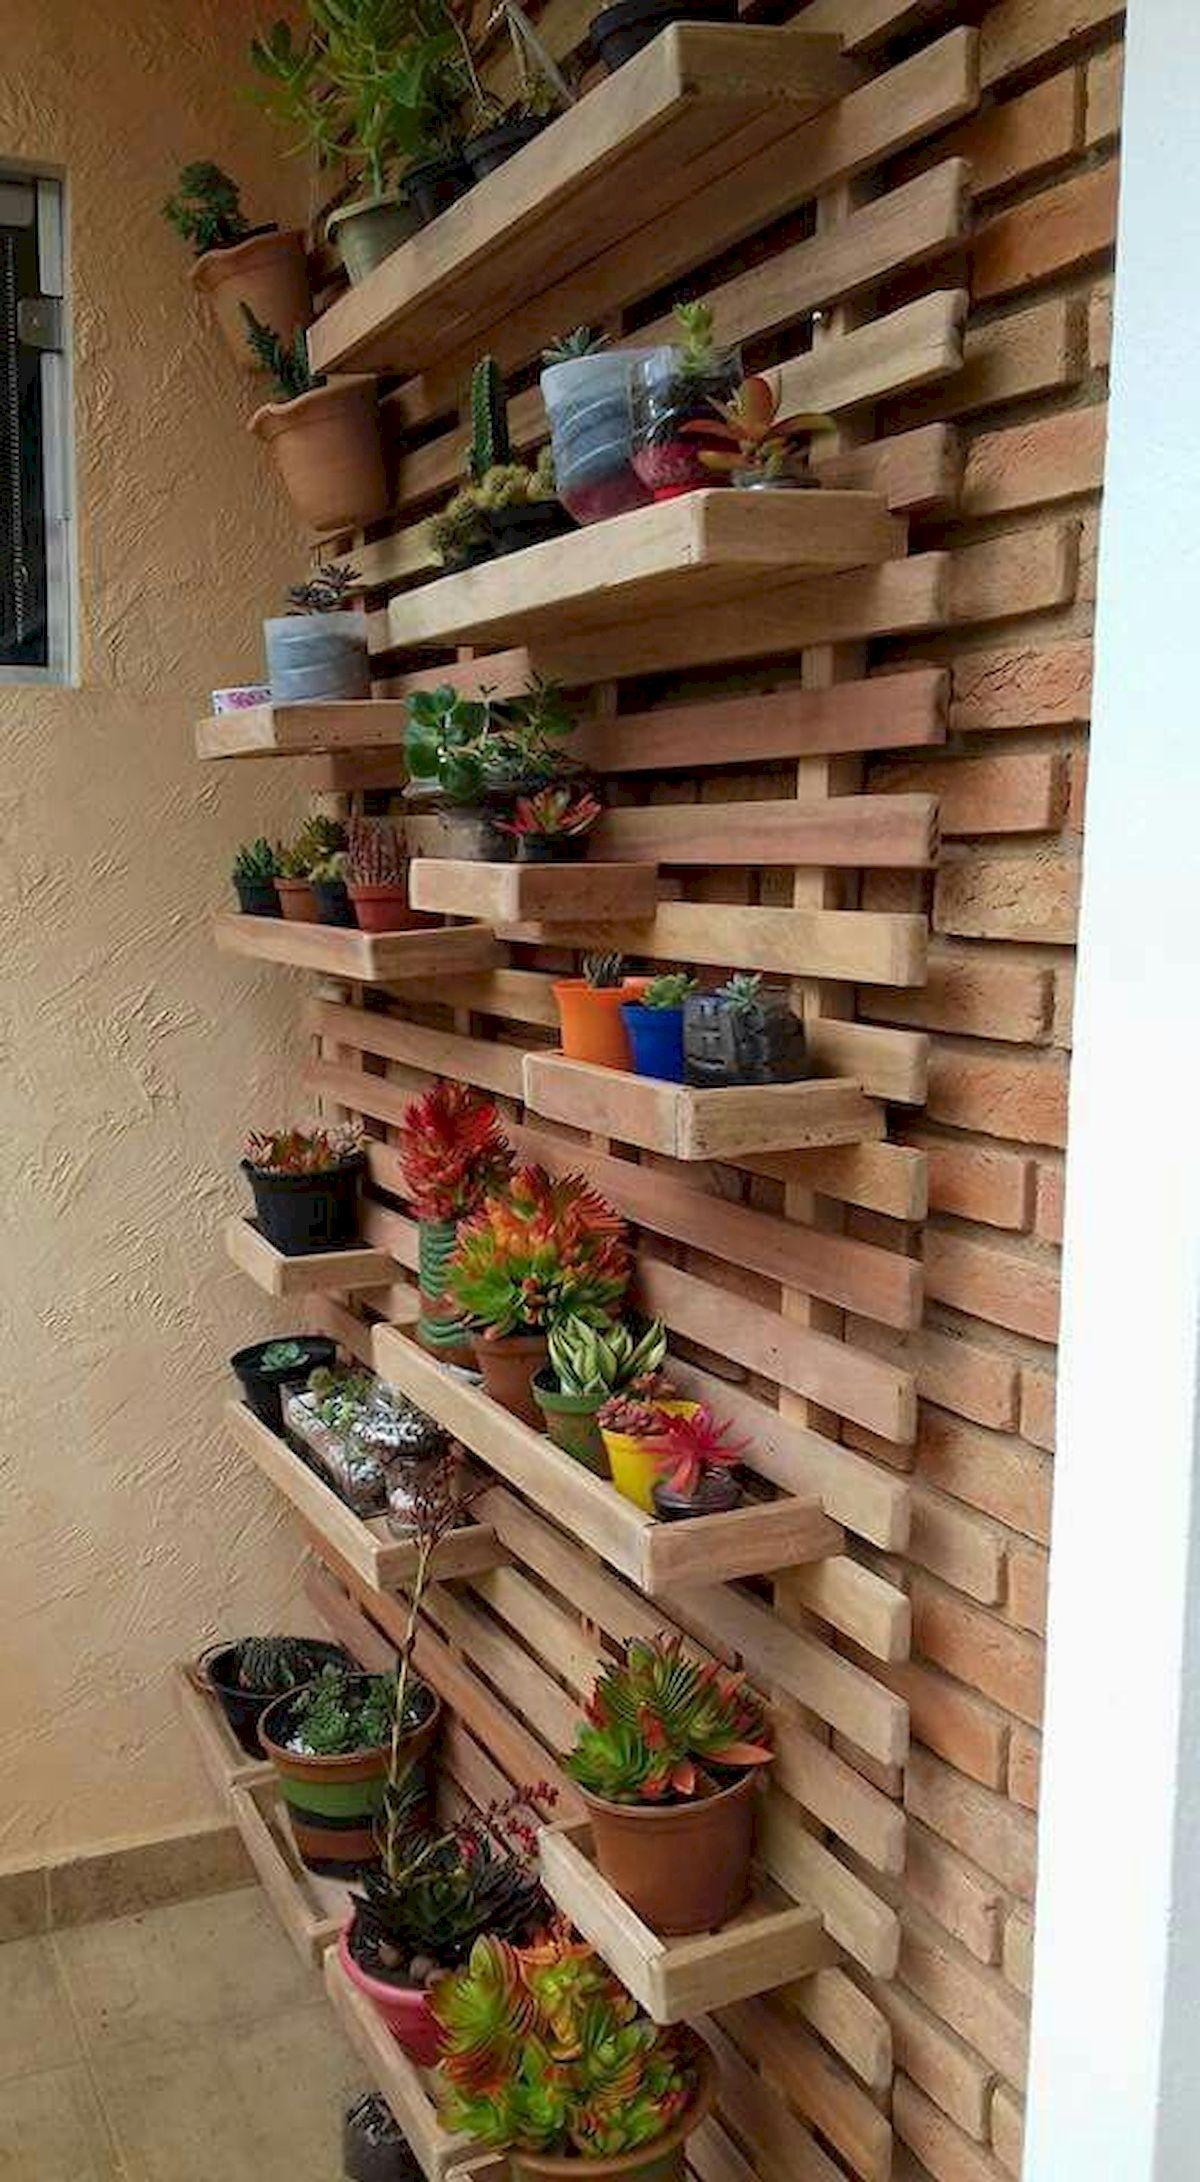 20 Fantastic DIY Planter Ideas for Your Front Porch (13)